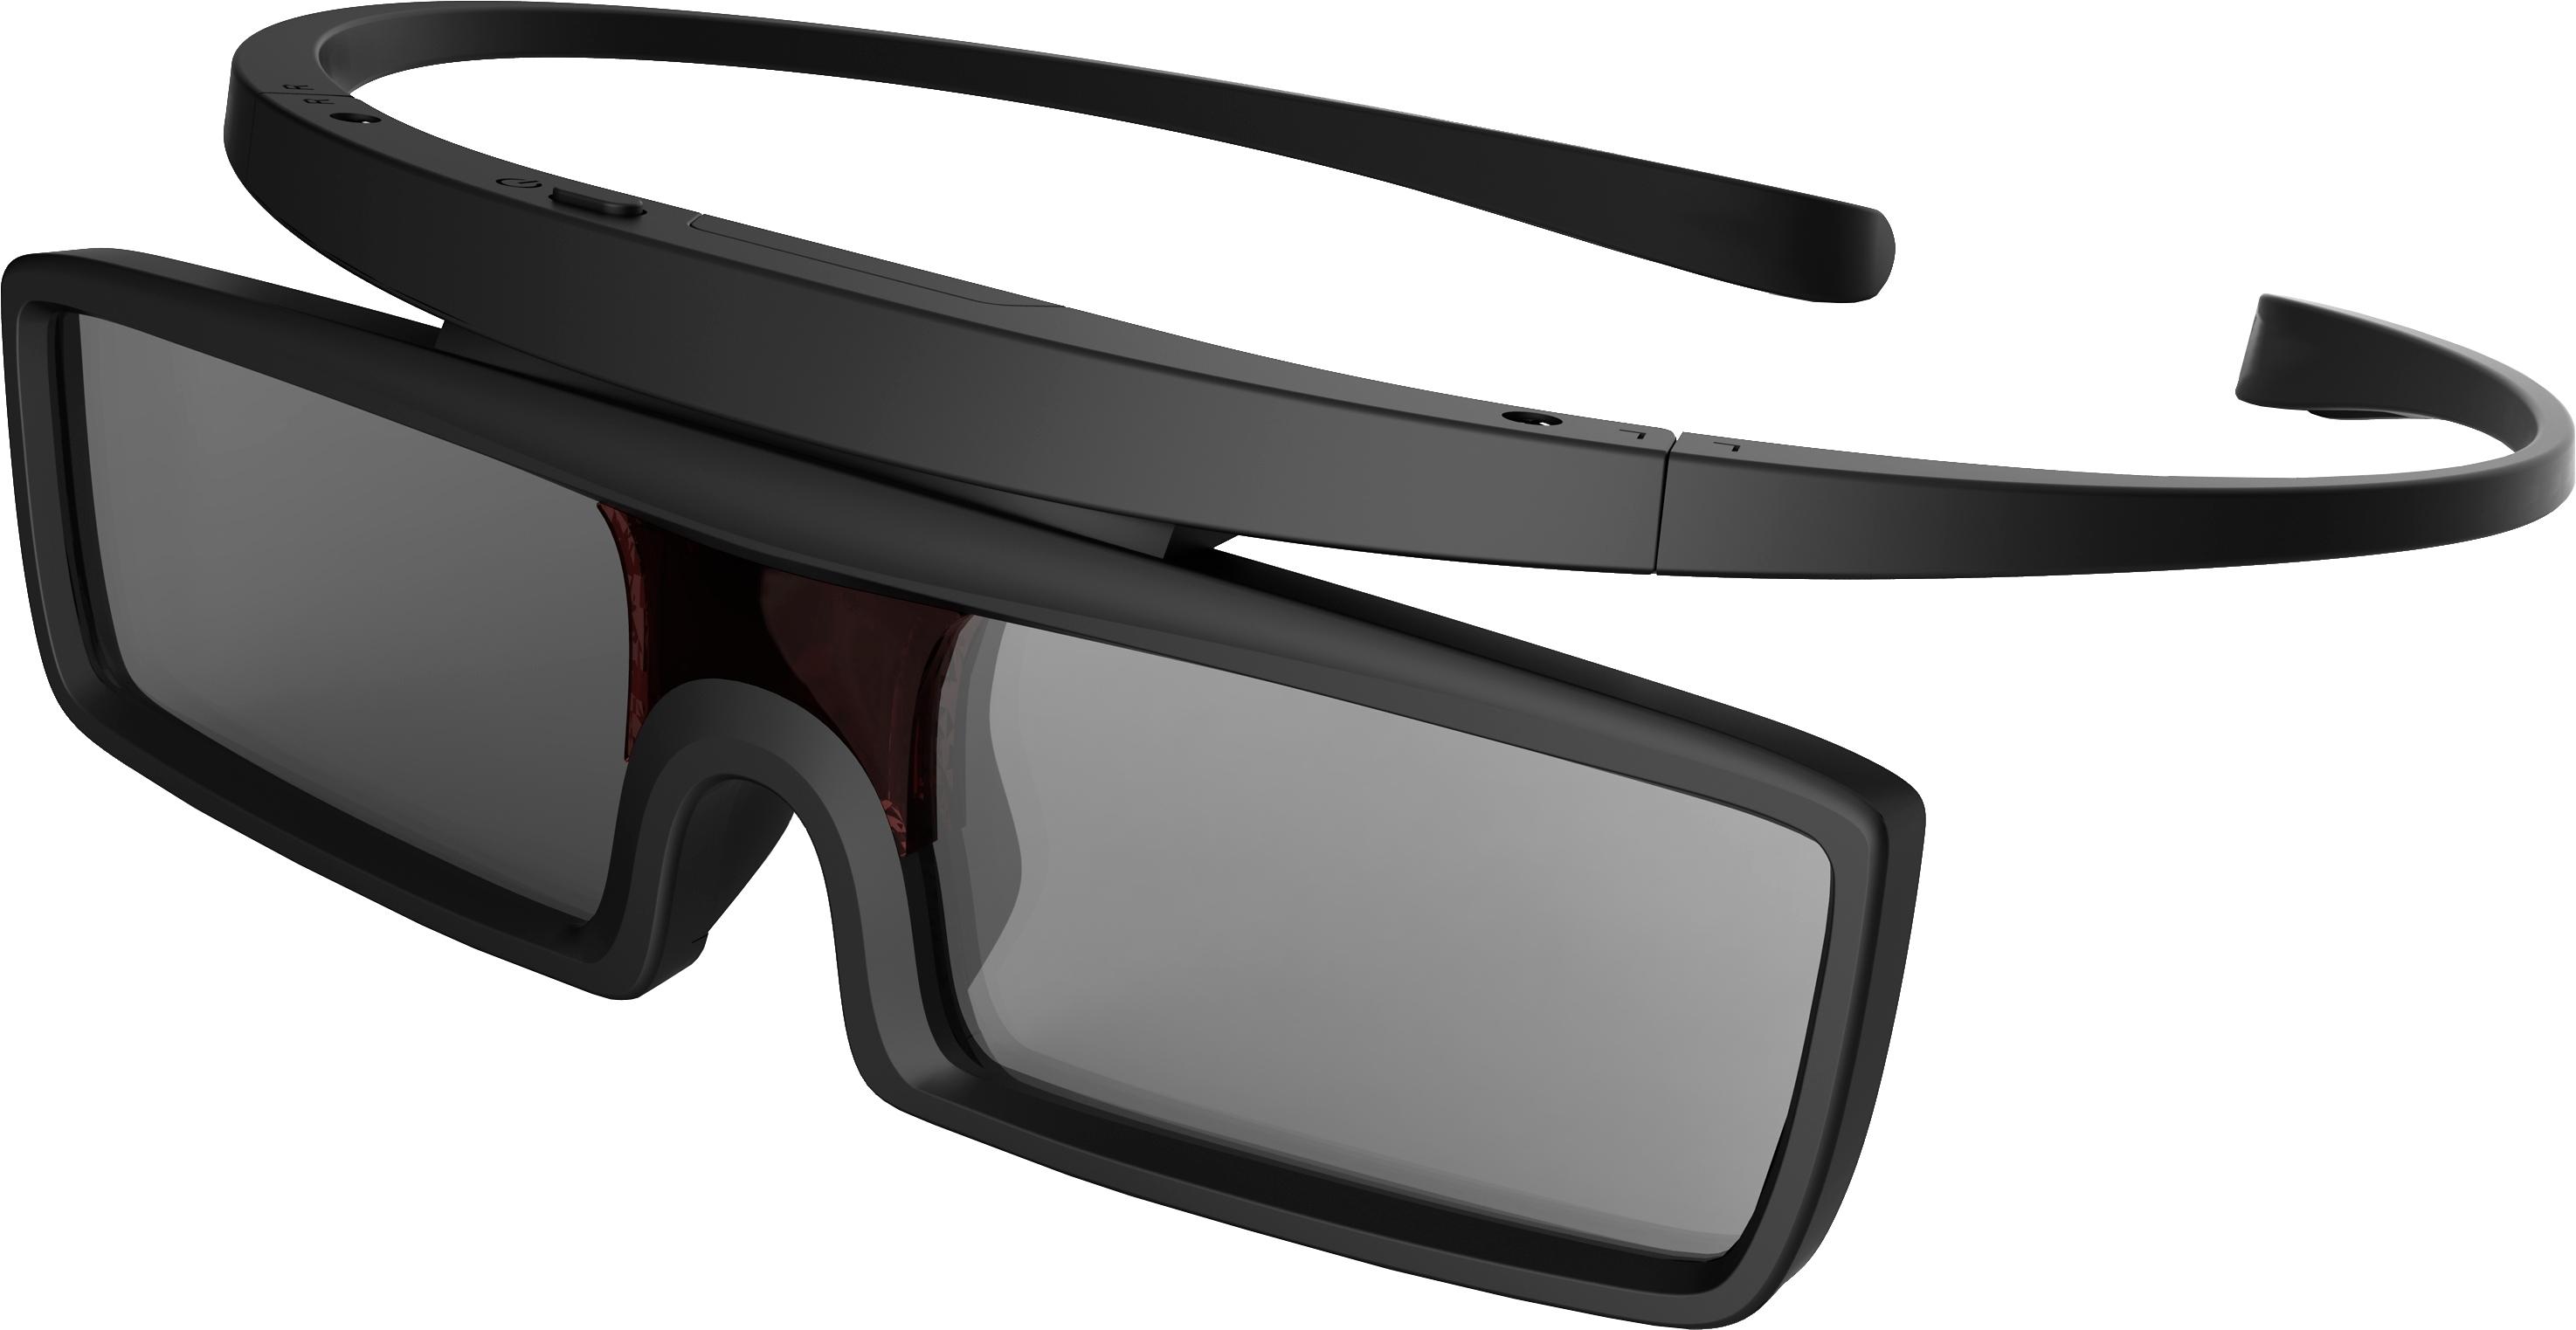 Hisense Active Shutter-bril FPS3D08A 3D bij OTTO online kopen